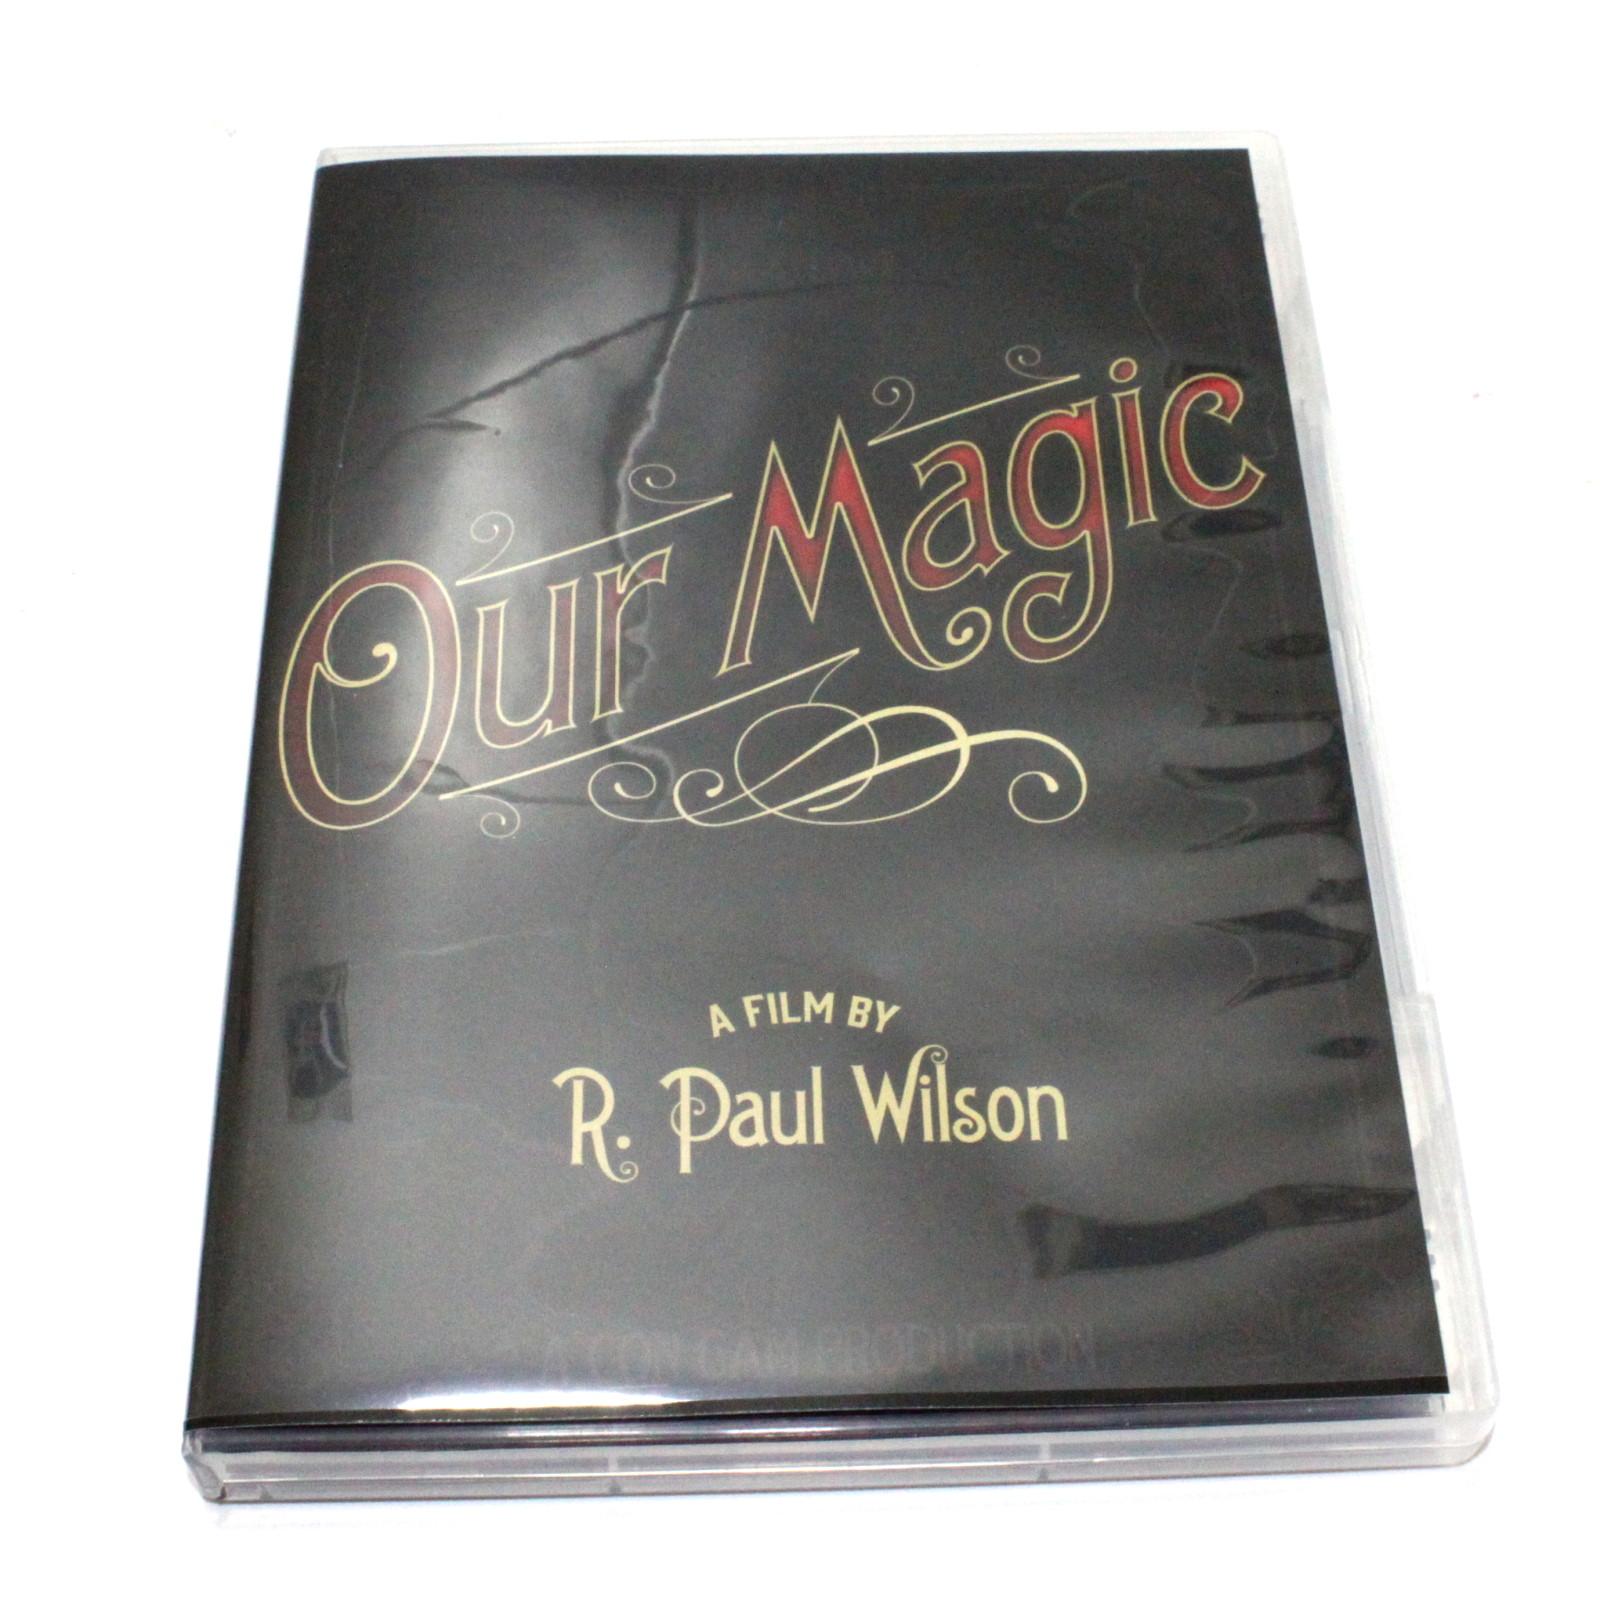 Our Magic Documentary by R. Paul Wilson